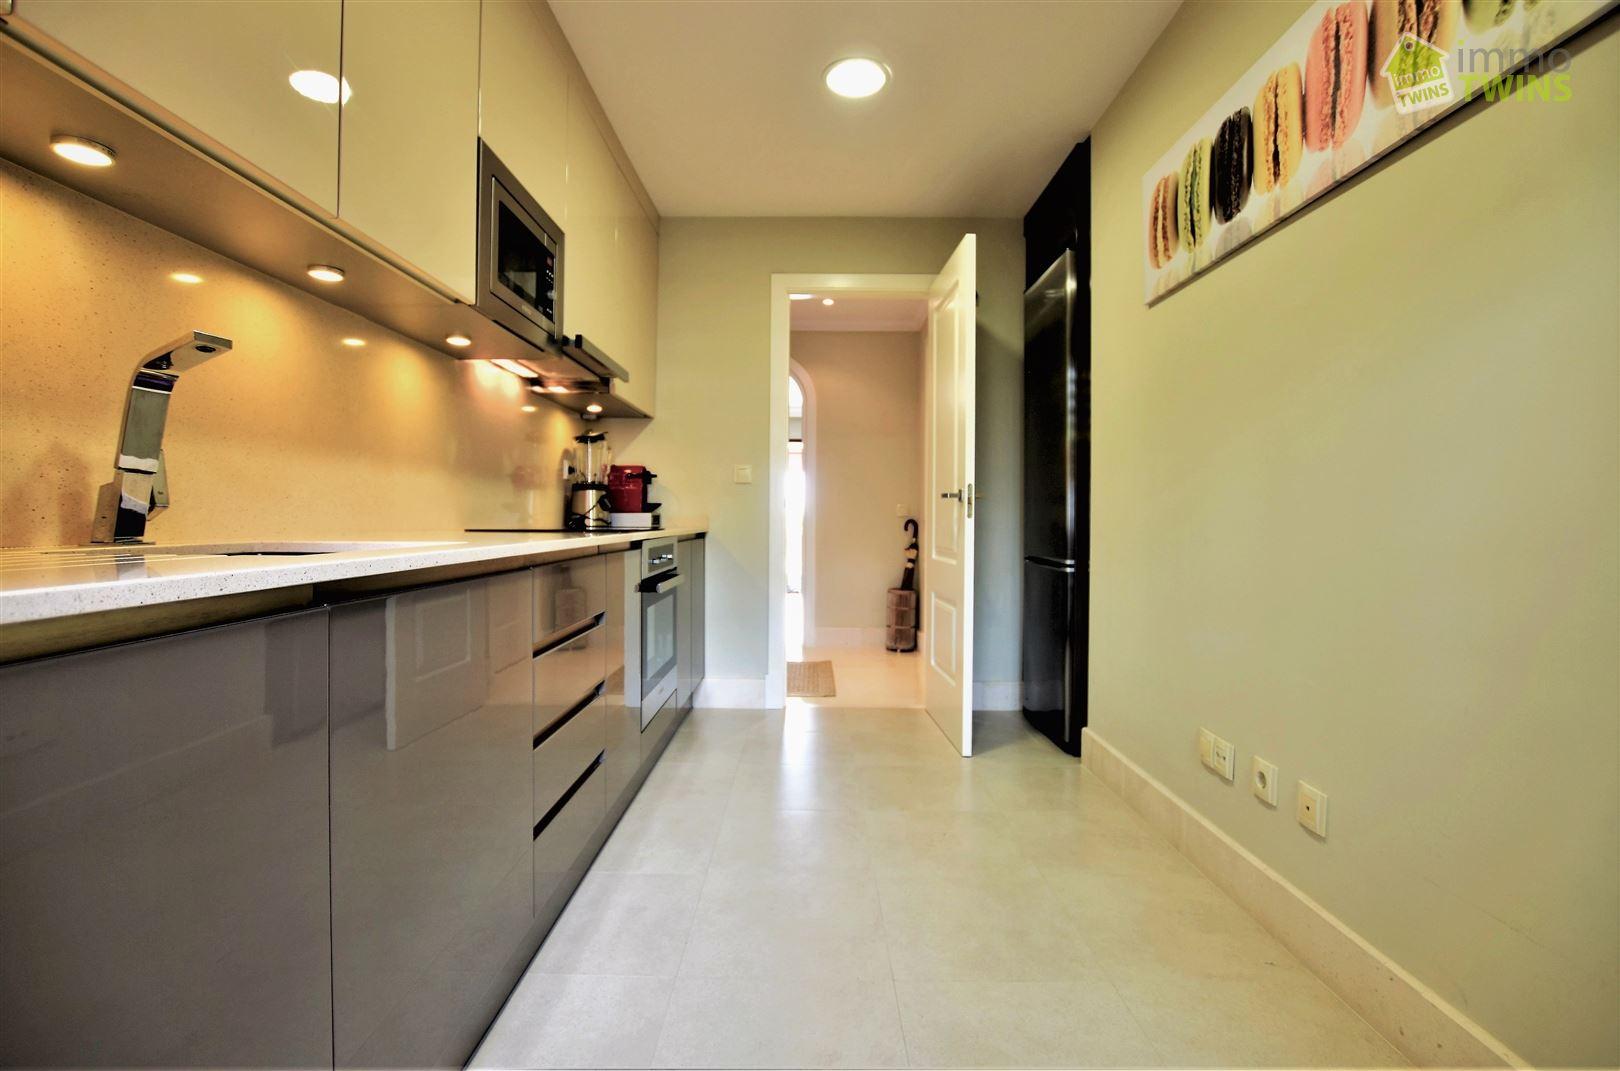 Foto 14 : Appartement te 29679 MARBELLA (Spanje) - Prijs € 485.000